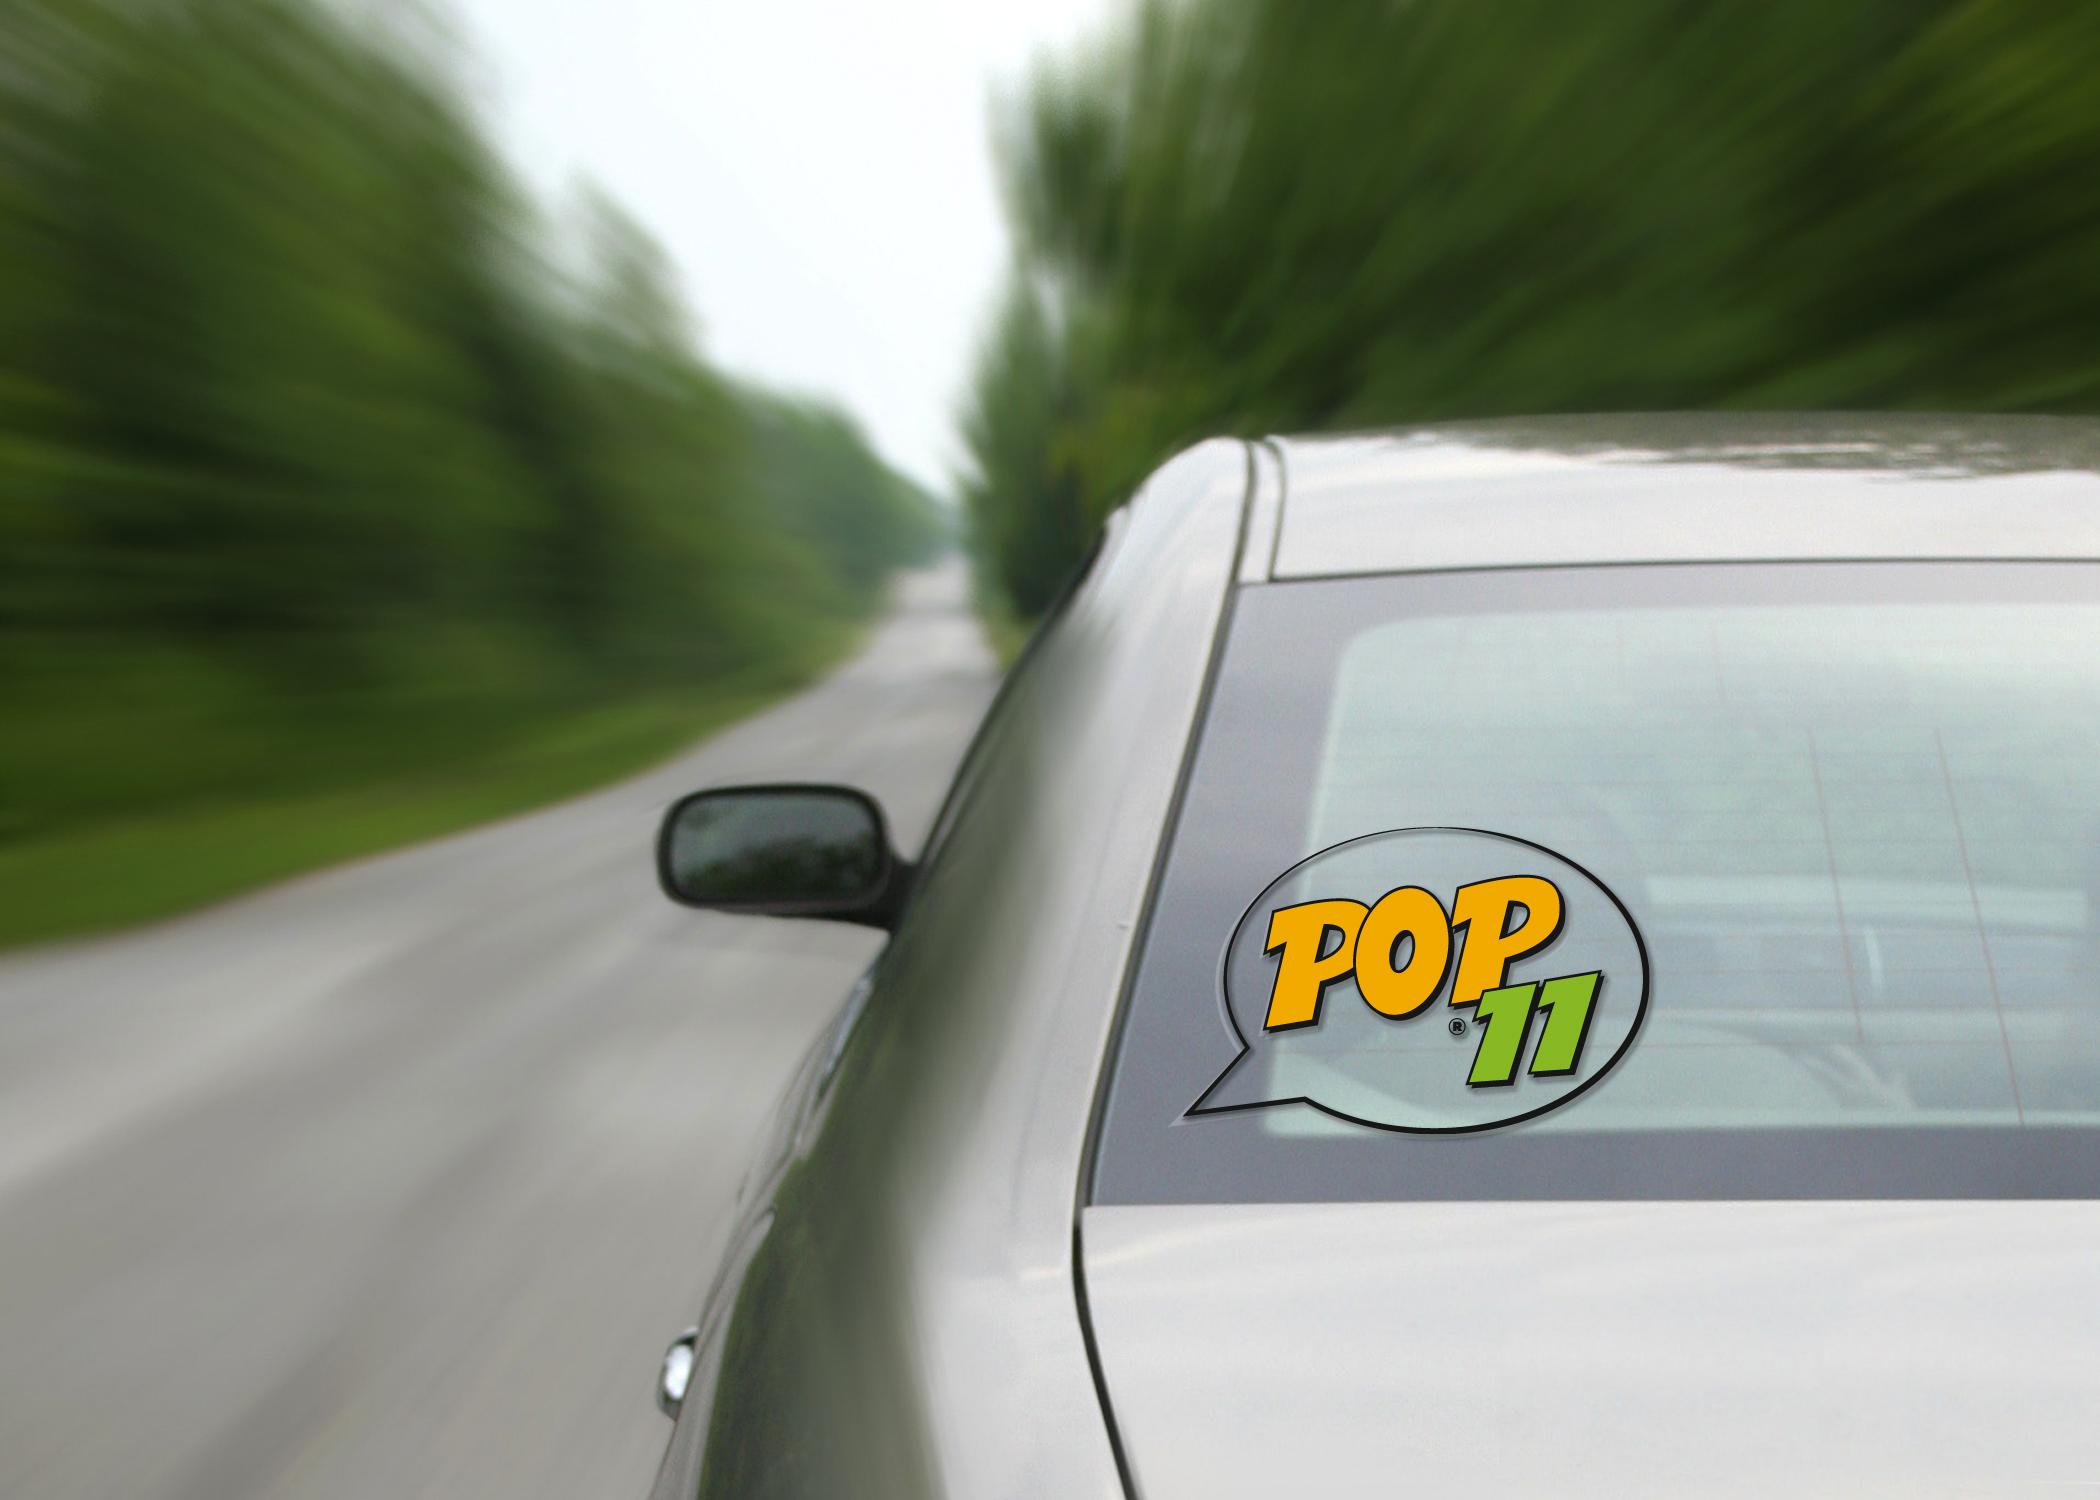 04 Car Decal Sticker Pop11 Digital Prints